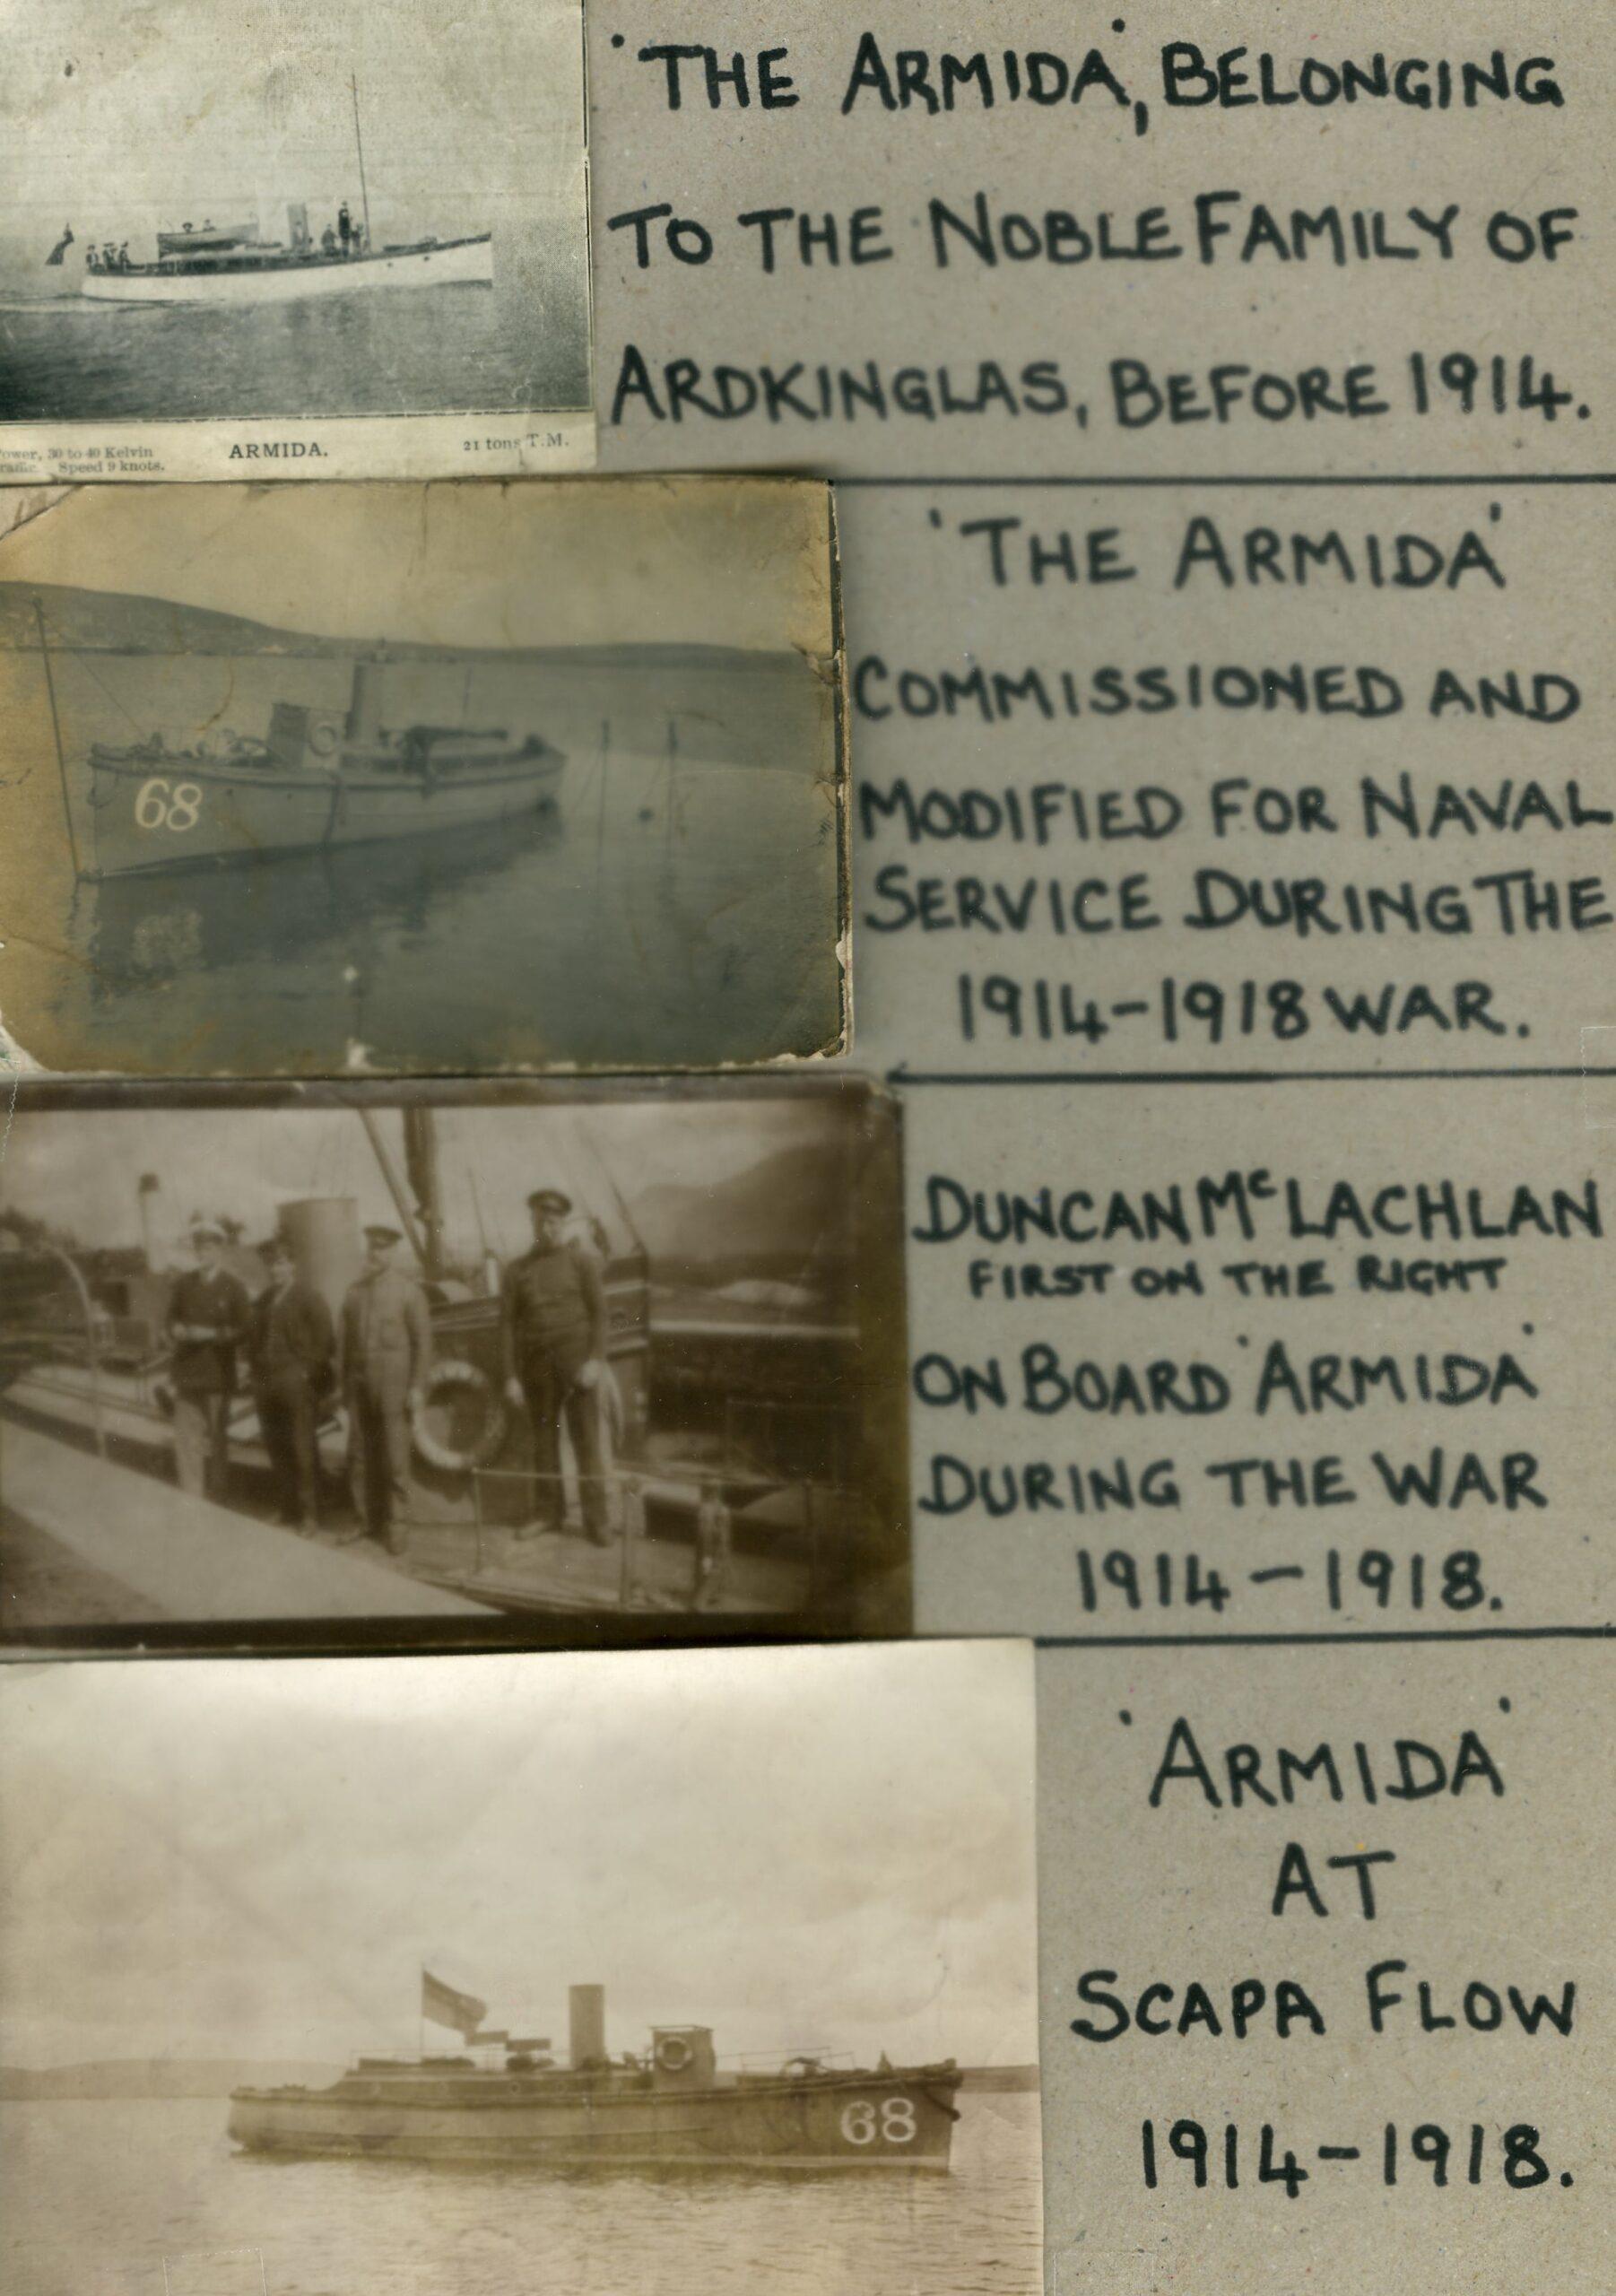 The Armida